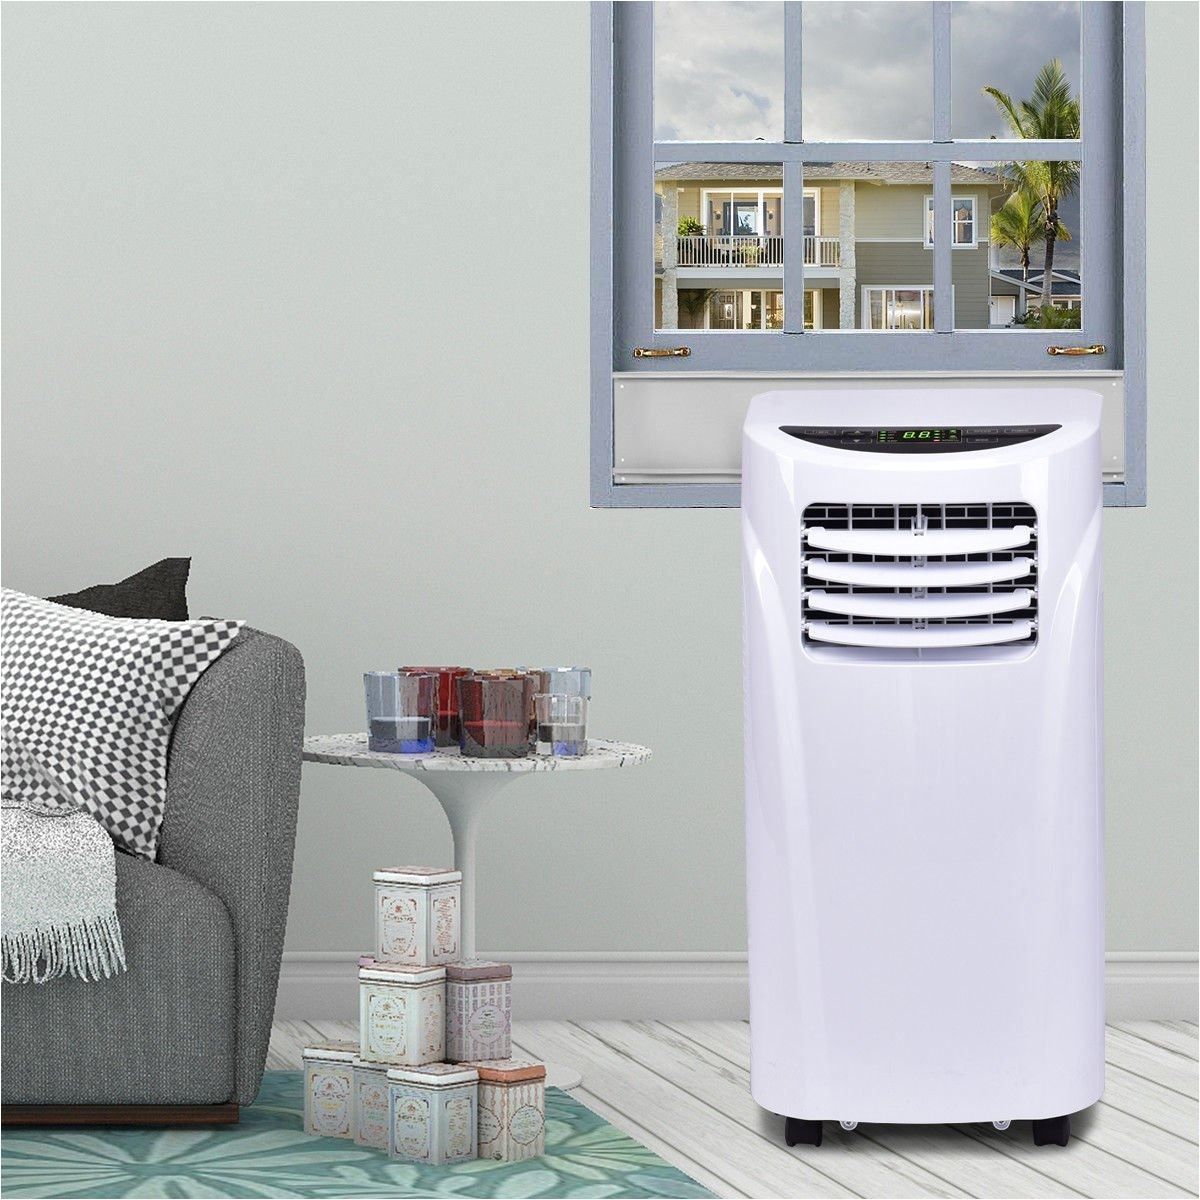 costway 10000 btu portable air conditioner dehumidifier function remote w window kit 0